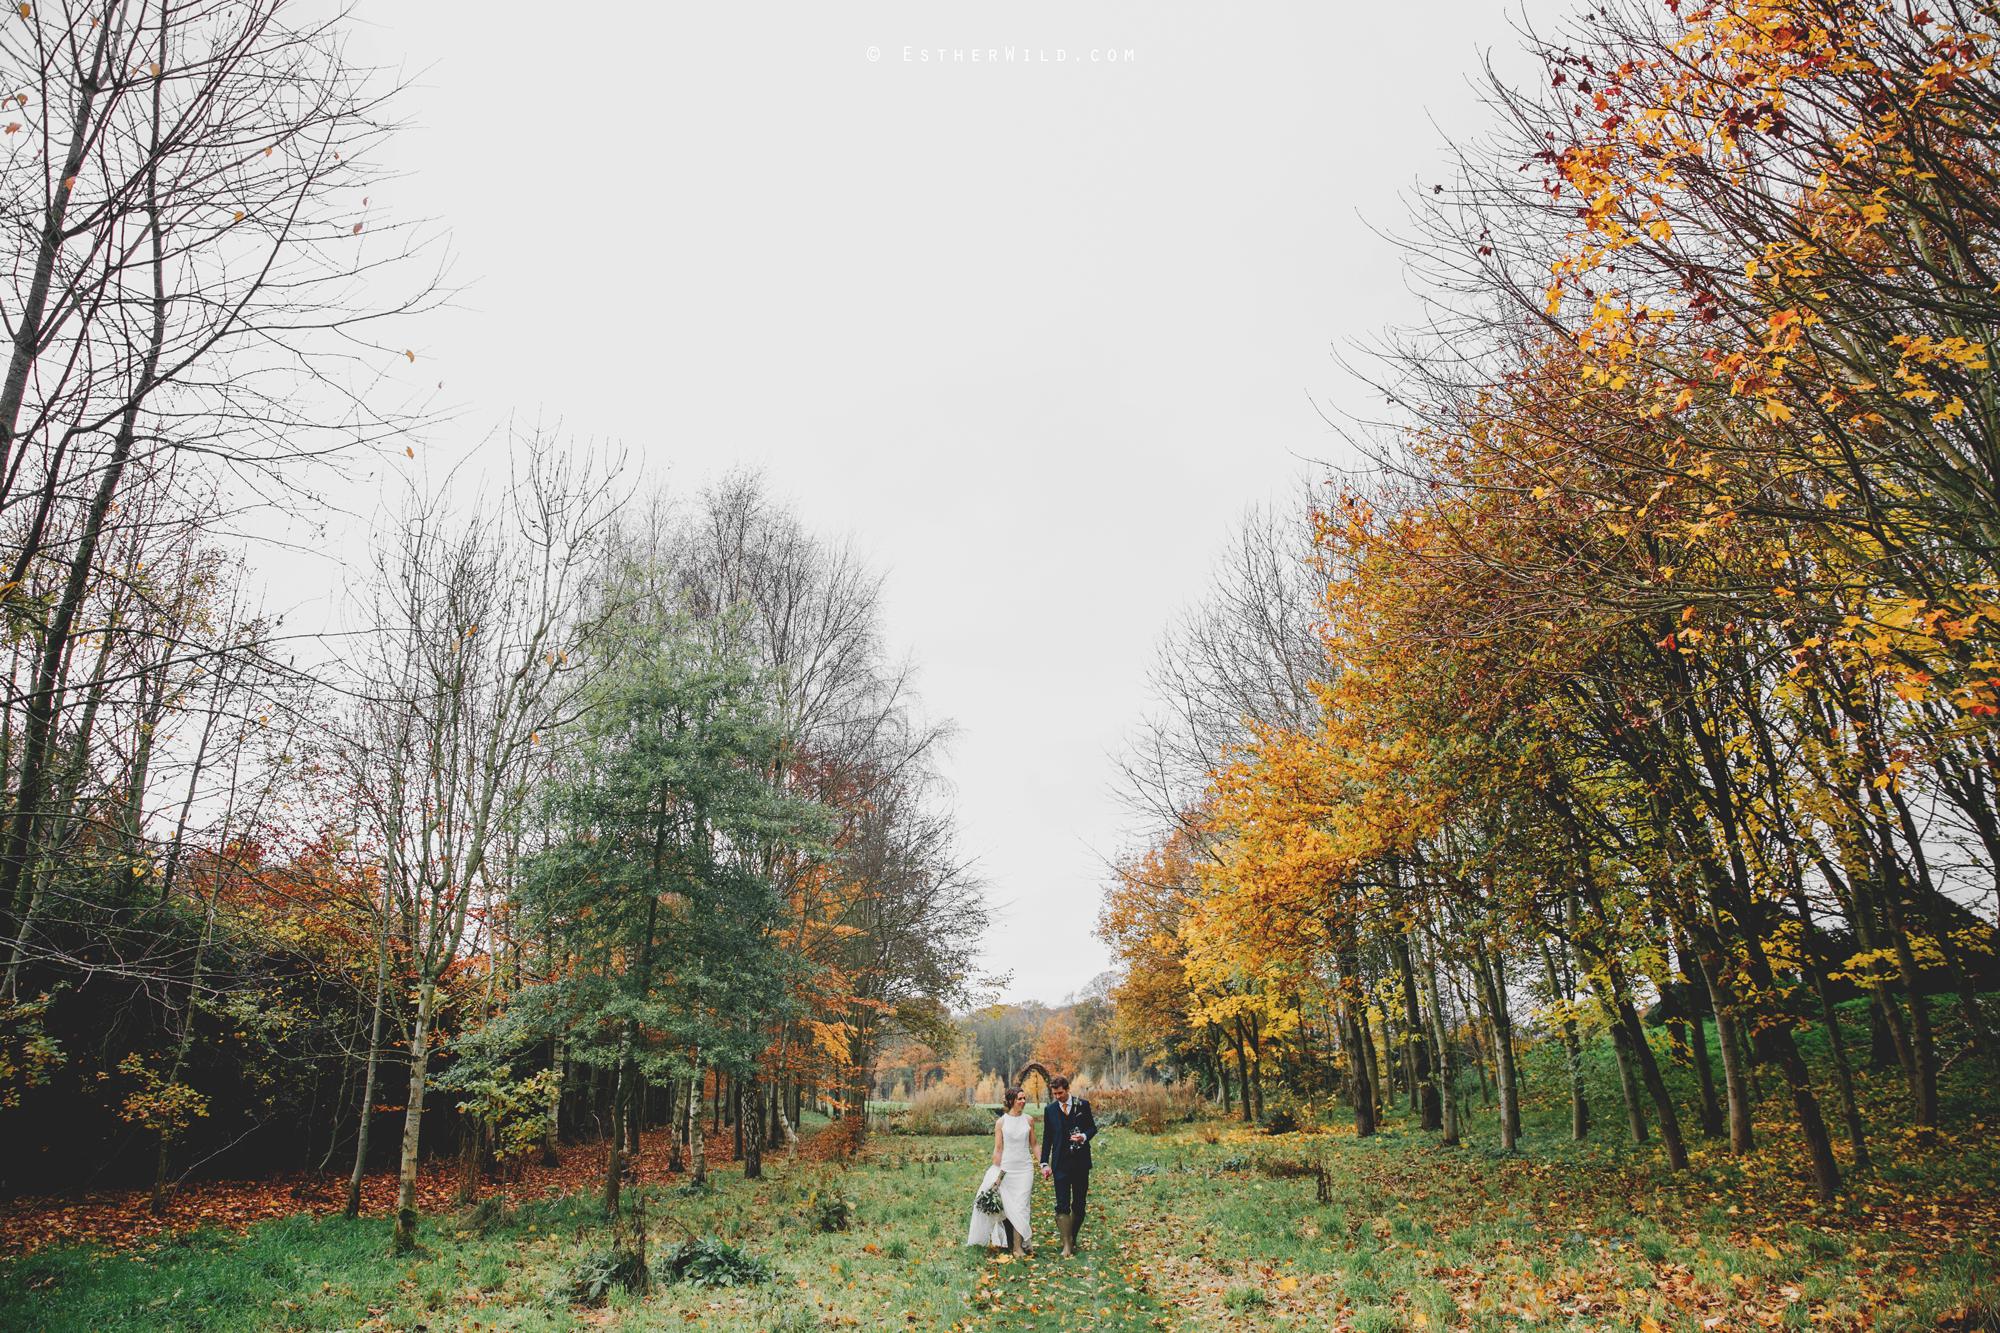 1117_Chaucer_Barn_Wedding_Photography_Esther_Wild_Norfolk_Photographer_IMG_1241.jpg